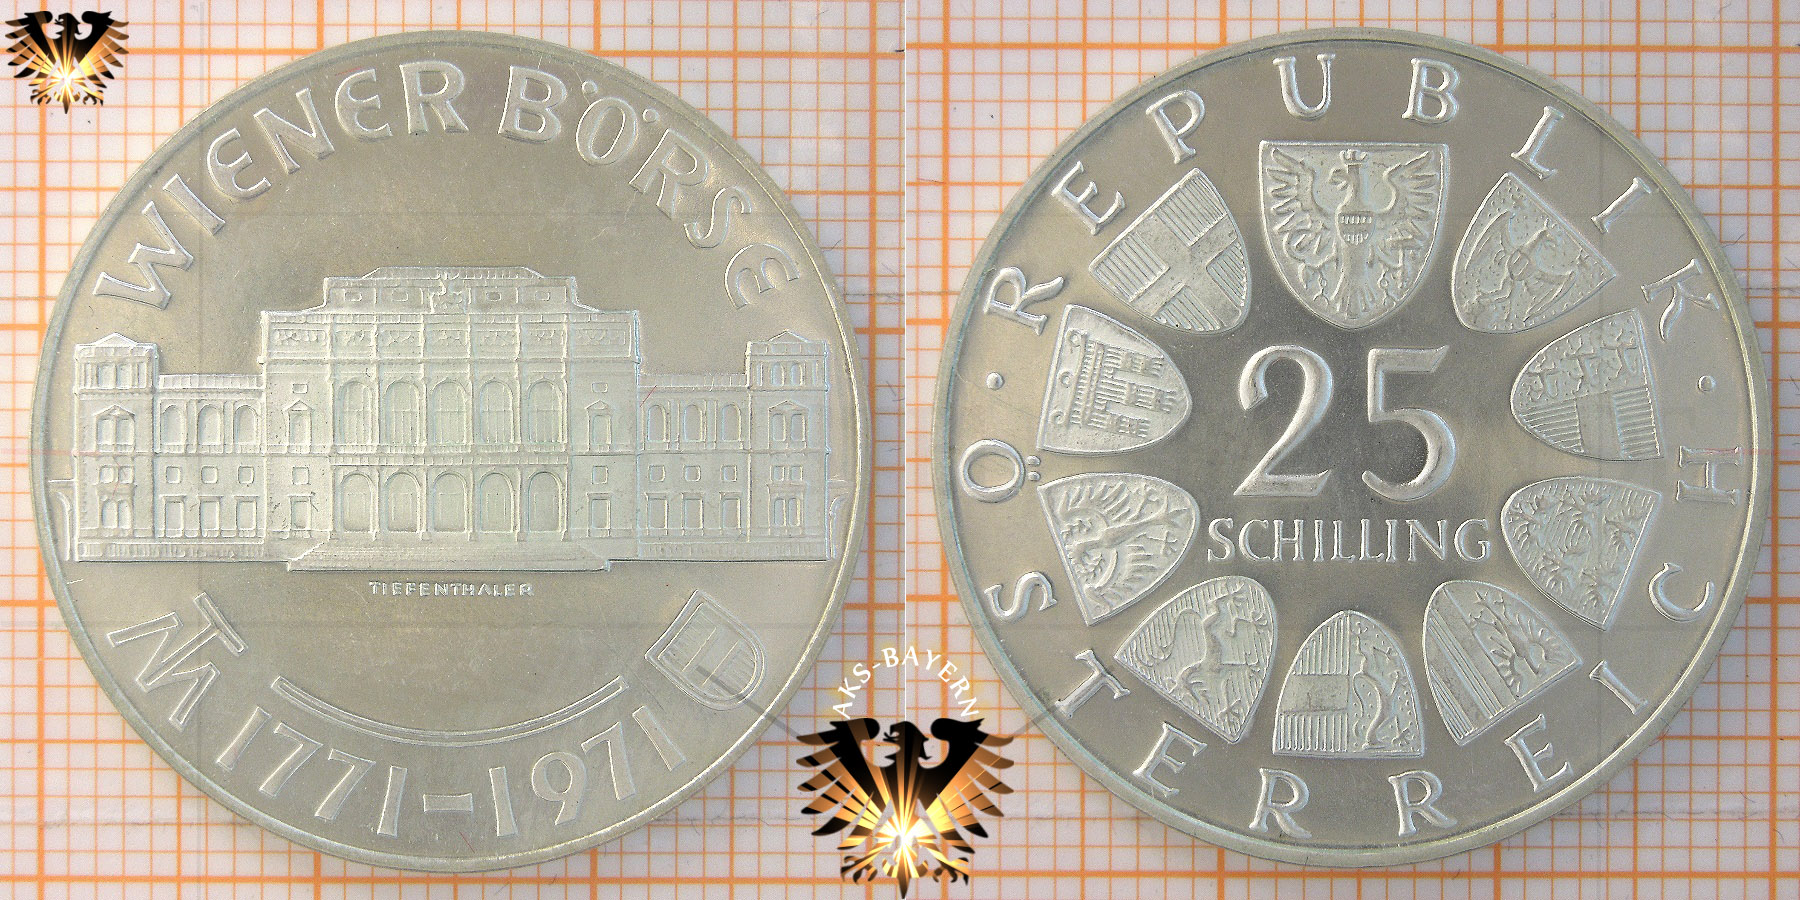 25 Schilling 1971 Wiener Börse 1771 1971 Gedenkmünze Silbermünze